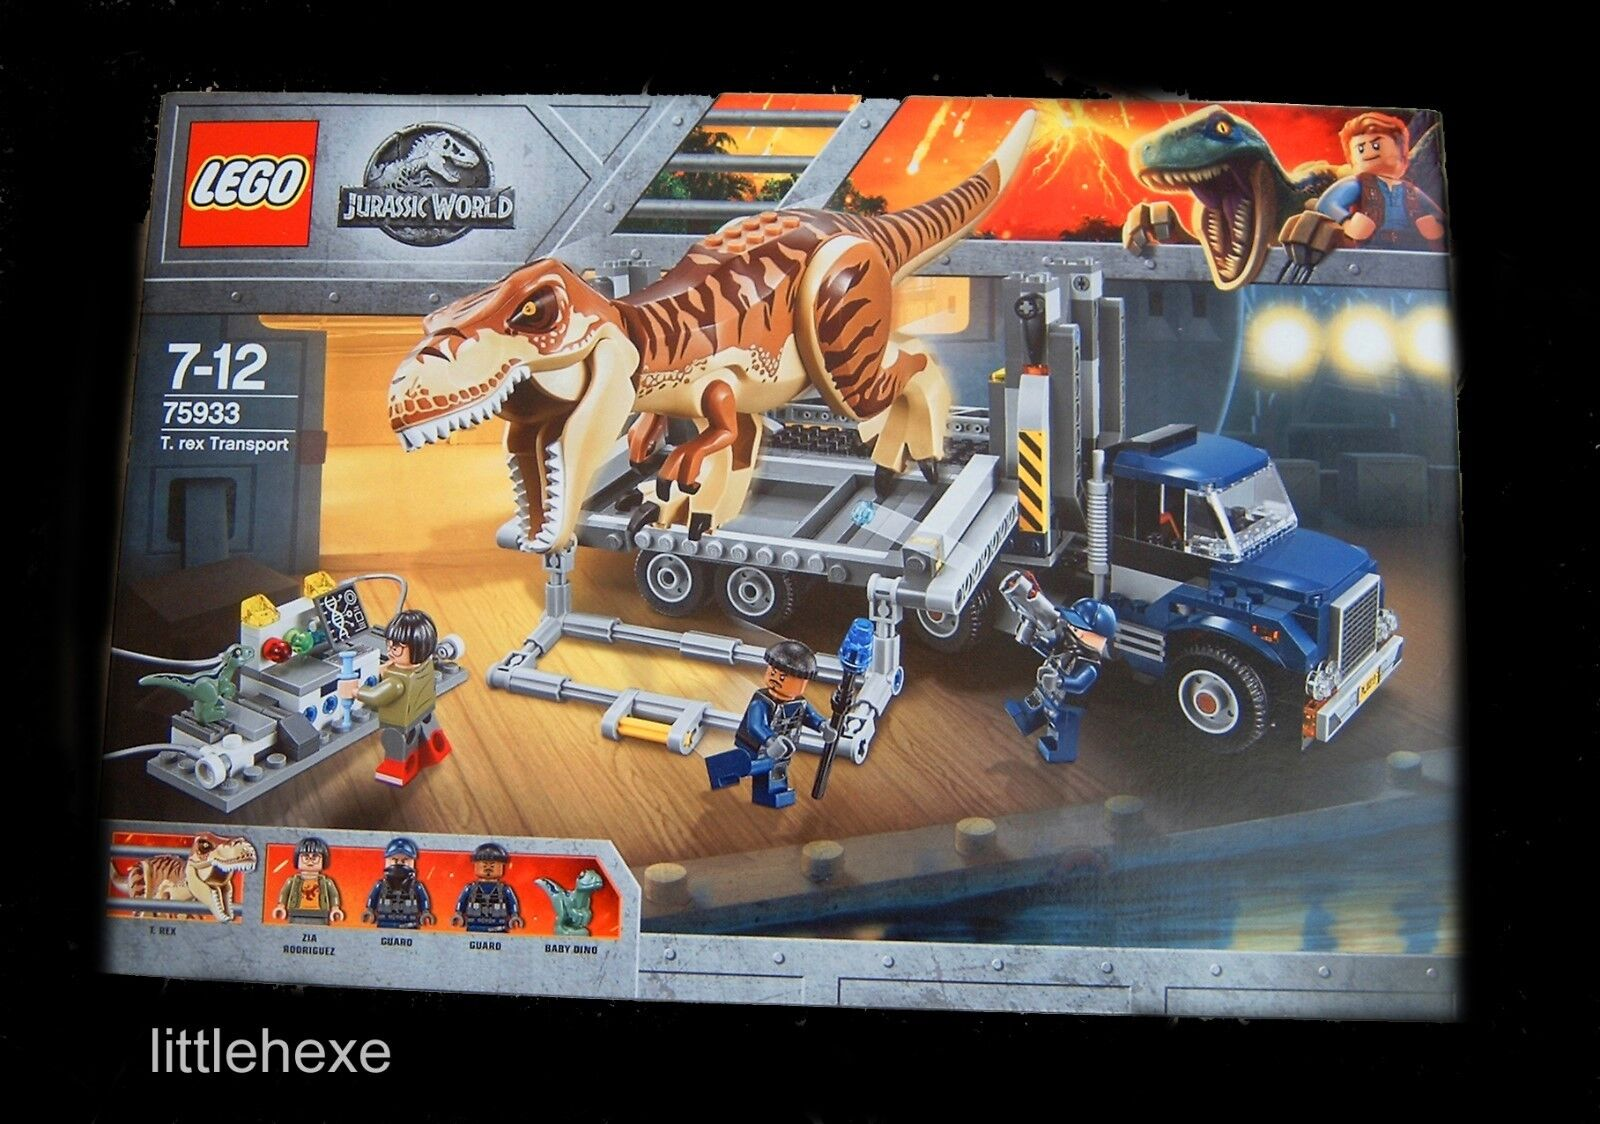 Lego Jurassic World 75933 T-Rex transport NOUVEAU Neuf dans sa boîte